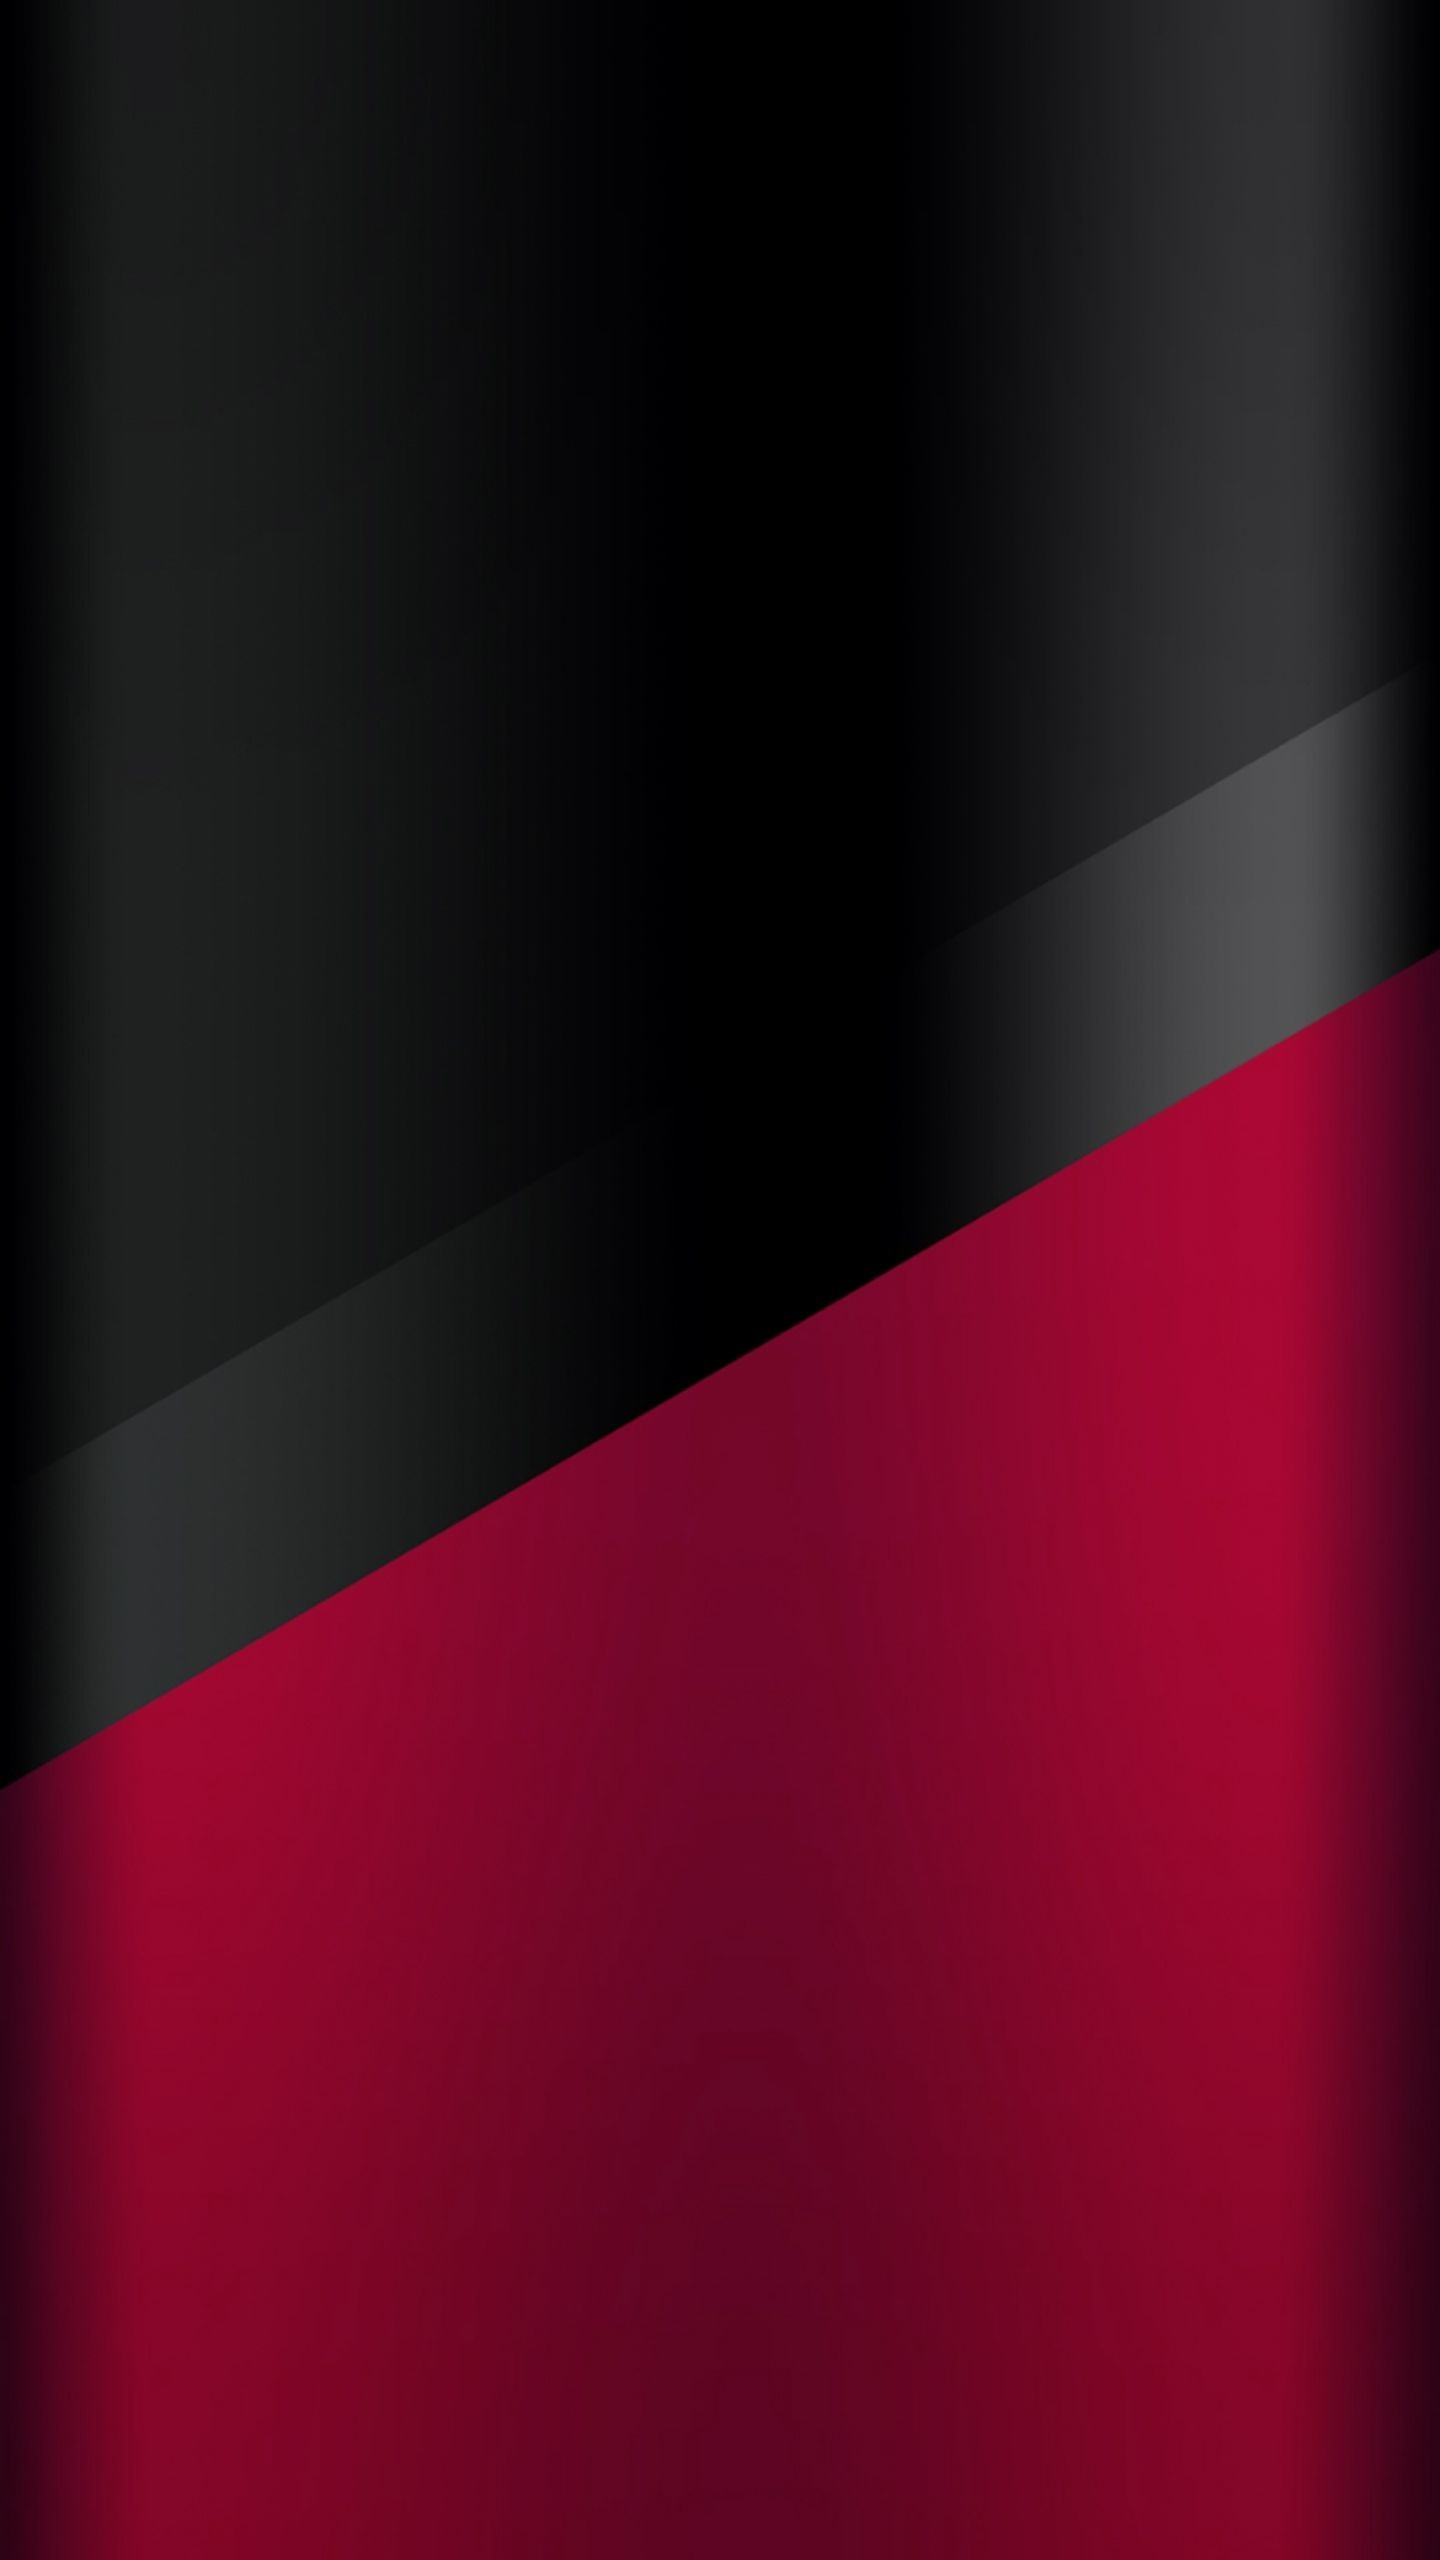 Samsung S6 Edge Wallpaper 69 Images